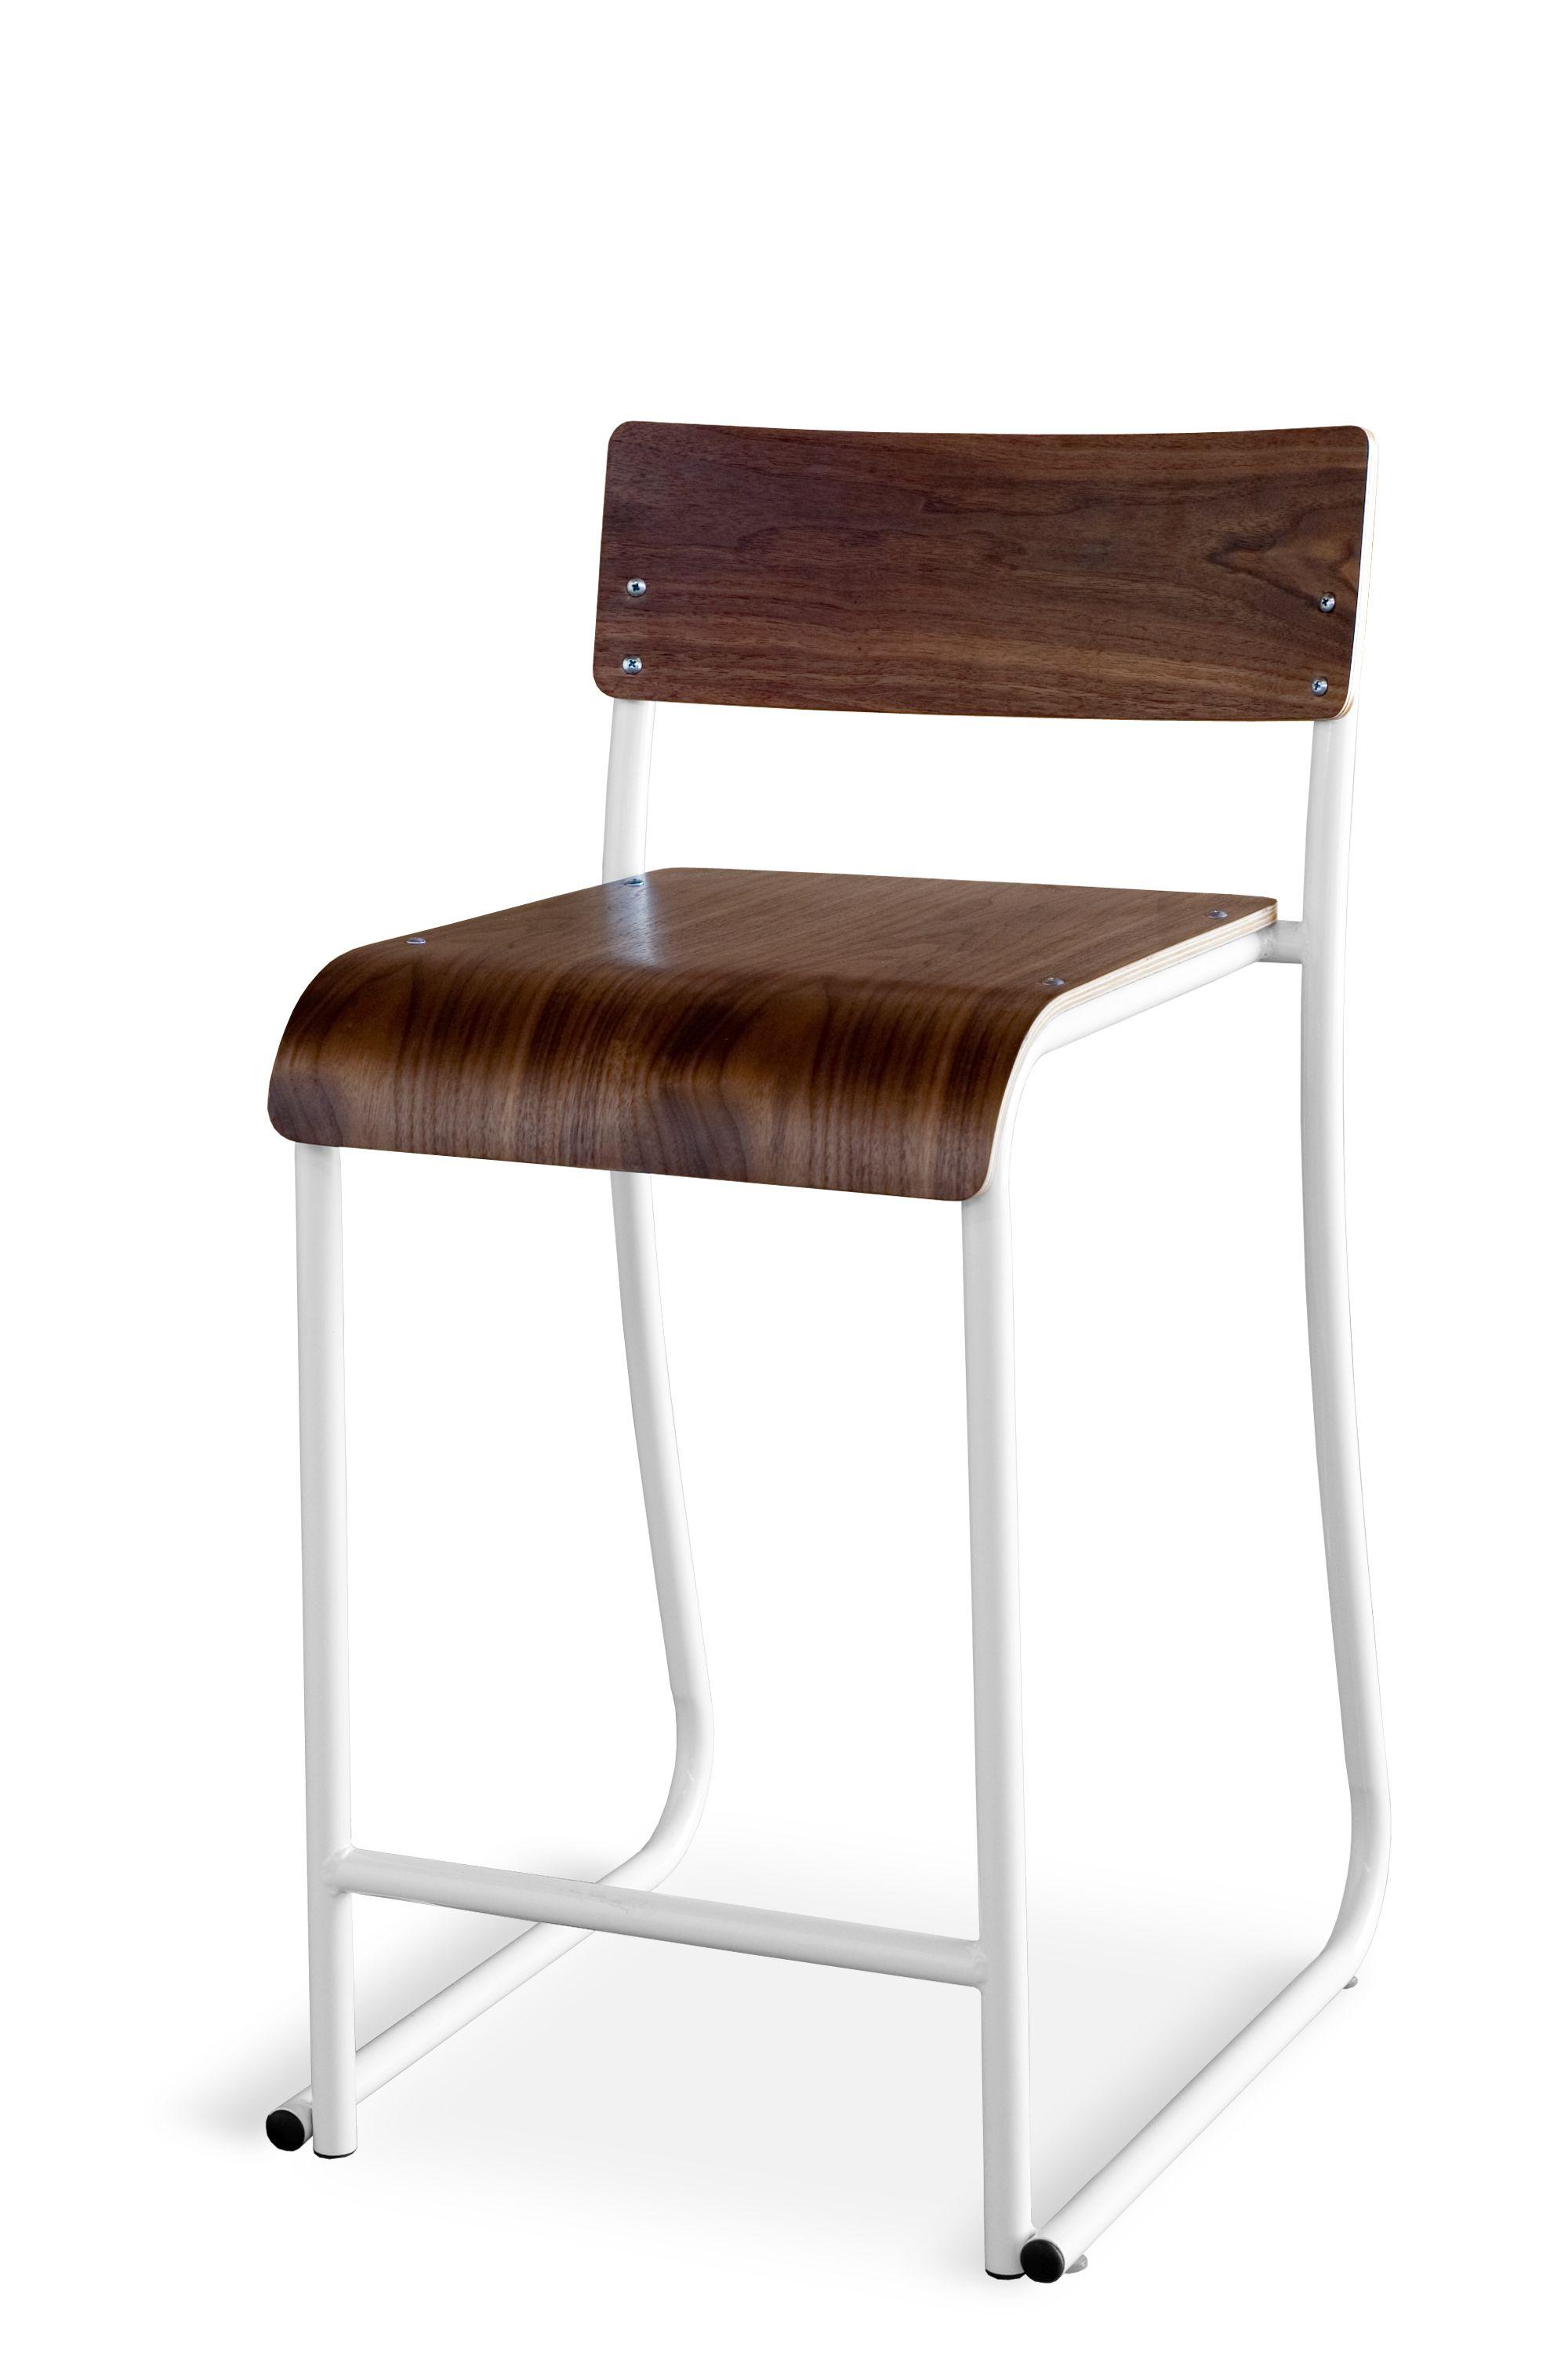 Remarkable Church Stool Walnut White Gus Modern Gus Modern Bralicious Painted Fabric Chair Ideas Braliciousco